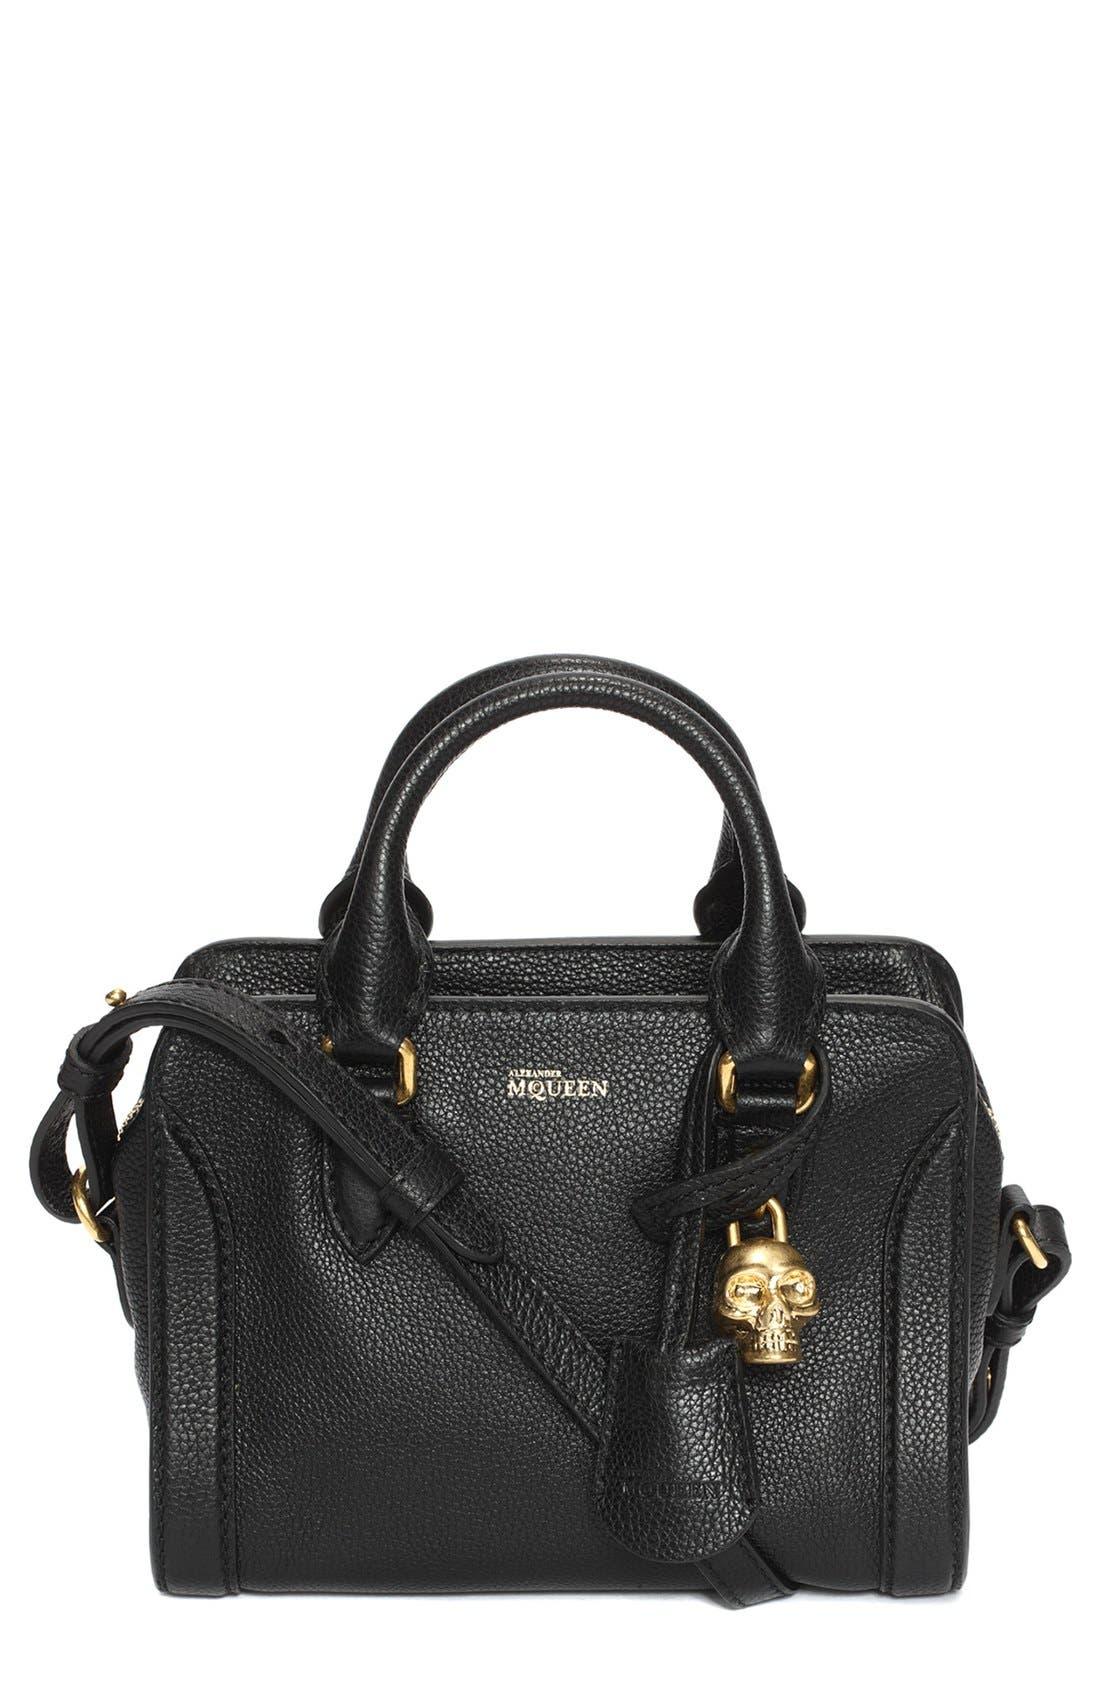 Main Image - Alexander McQueen 'Mini Padlock' Calfskin Leather Duffel Bag